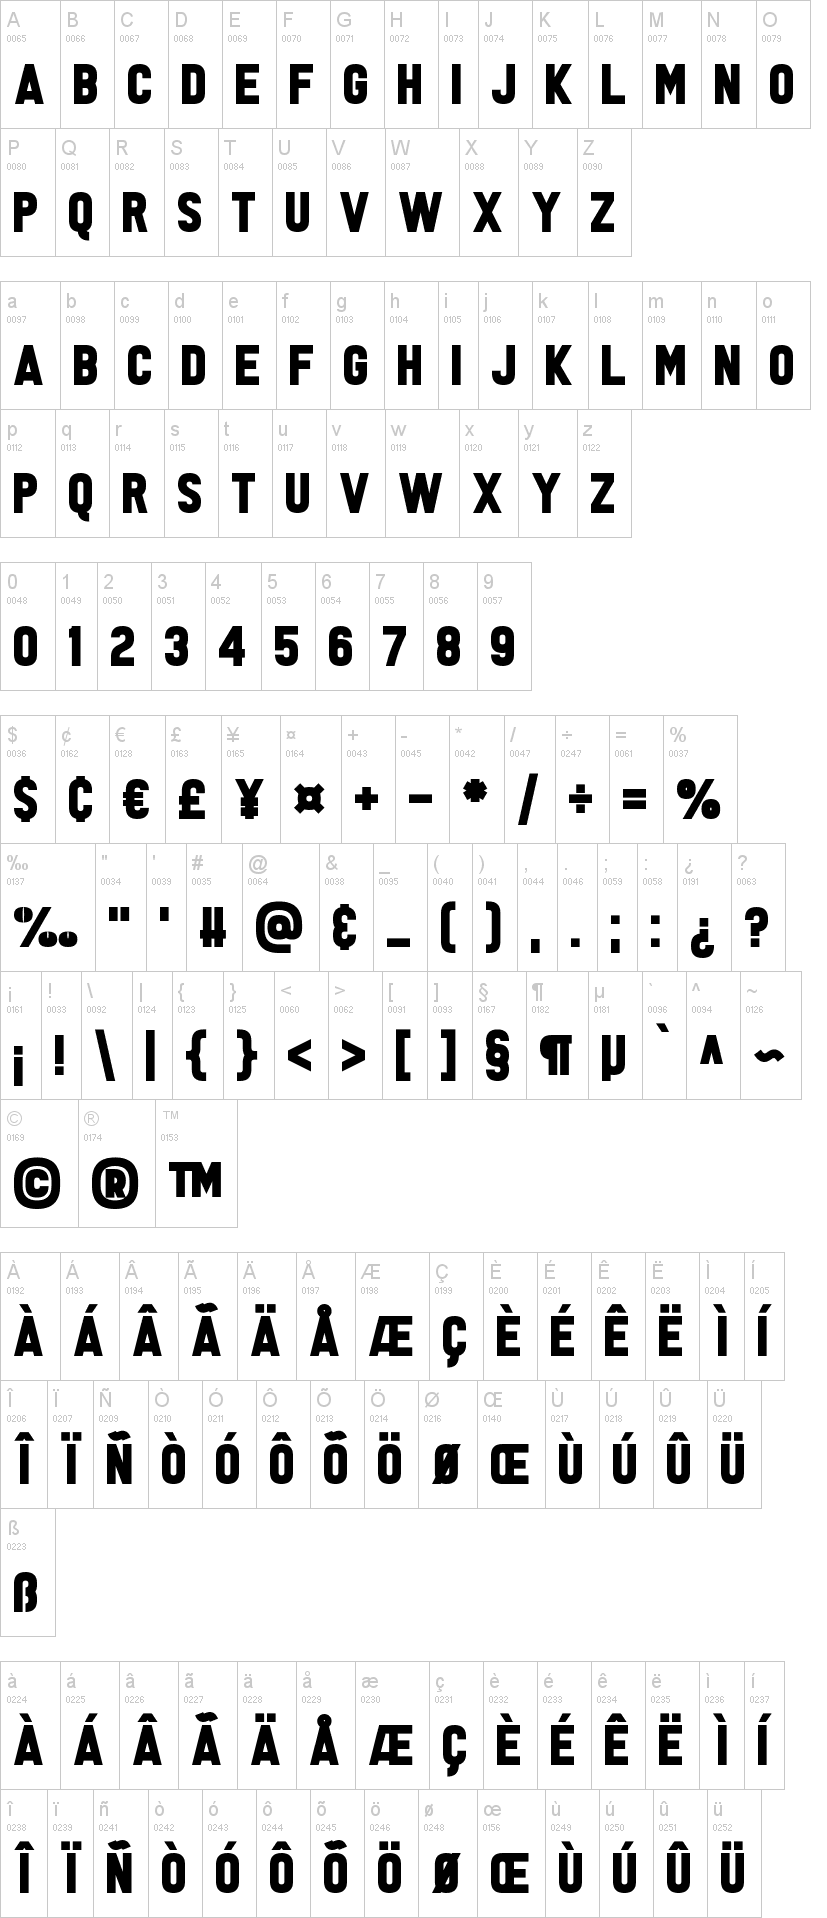 Tabloid Scuzzball Font-1